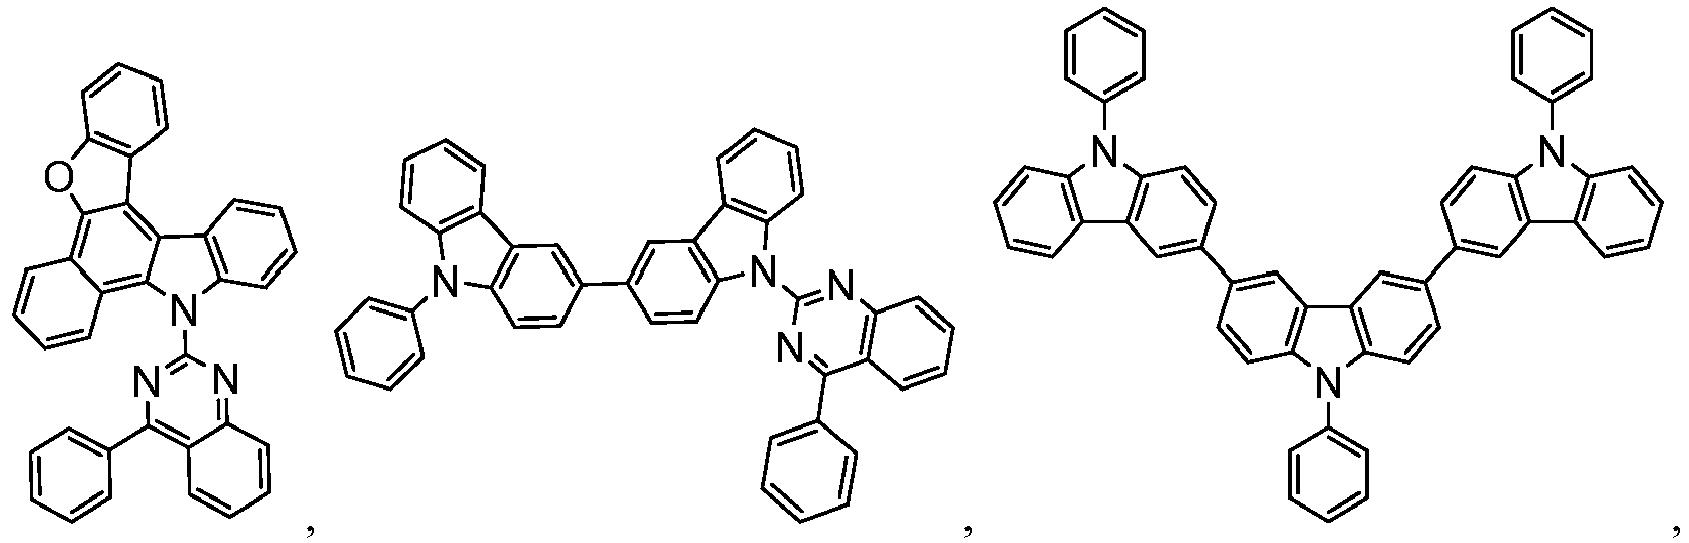 Figure imgb0165